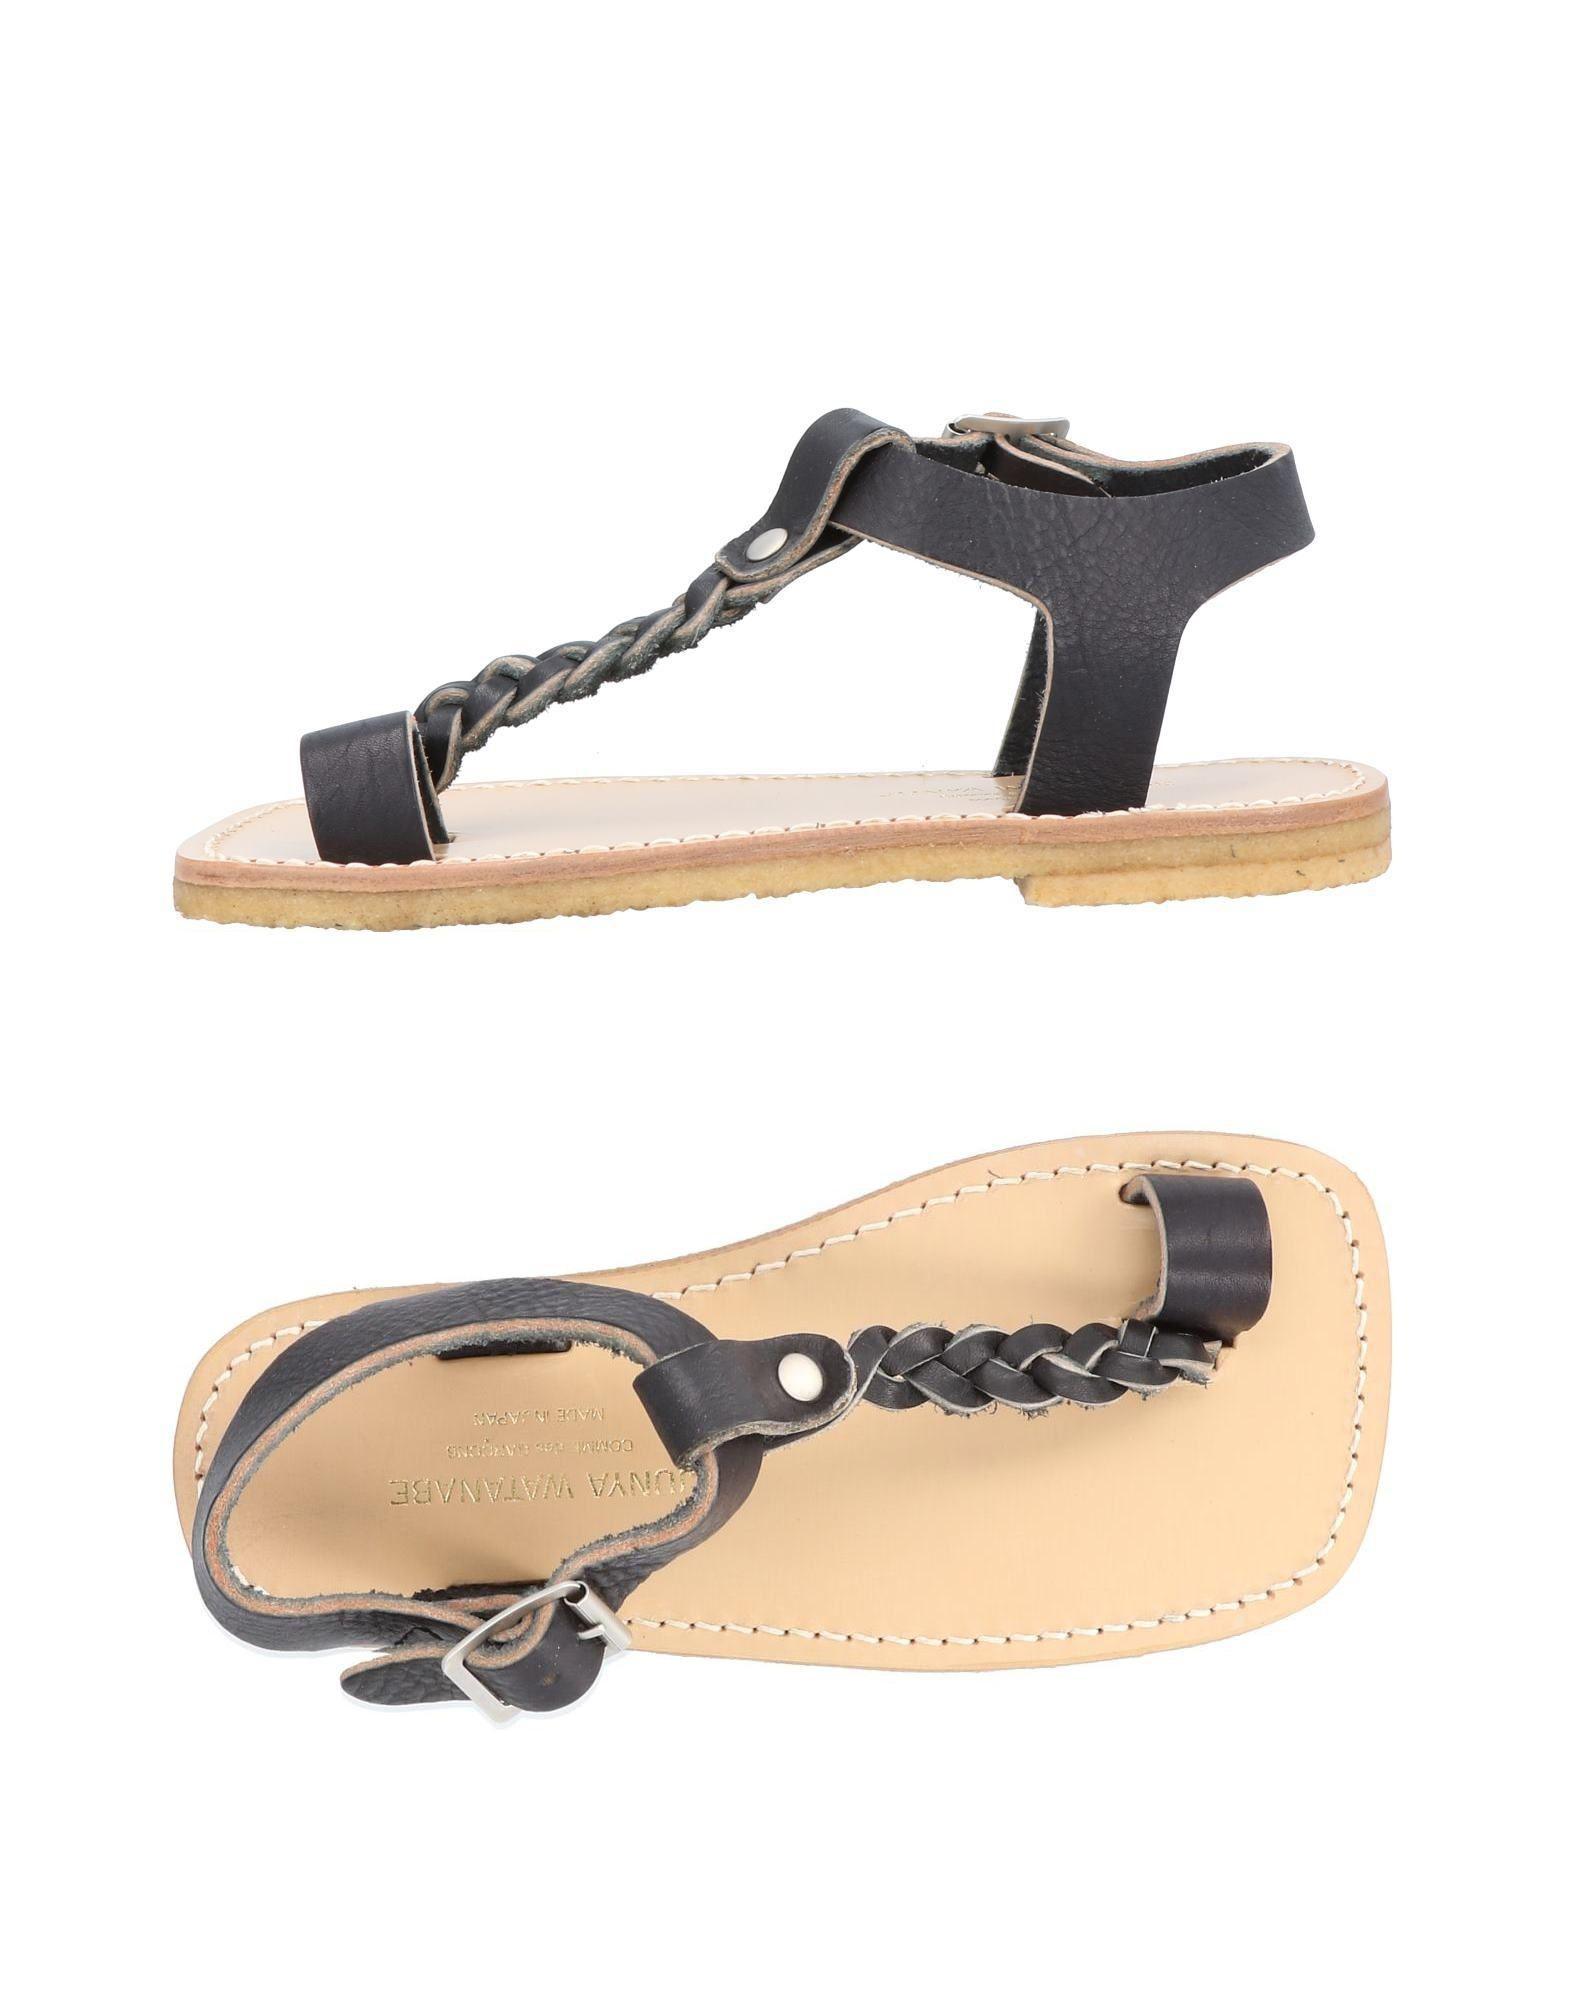 FOOTWEAR - Toe post sandals Junya Watanabe koB5eQ